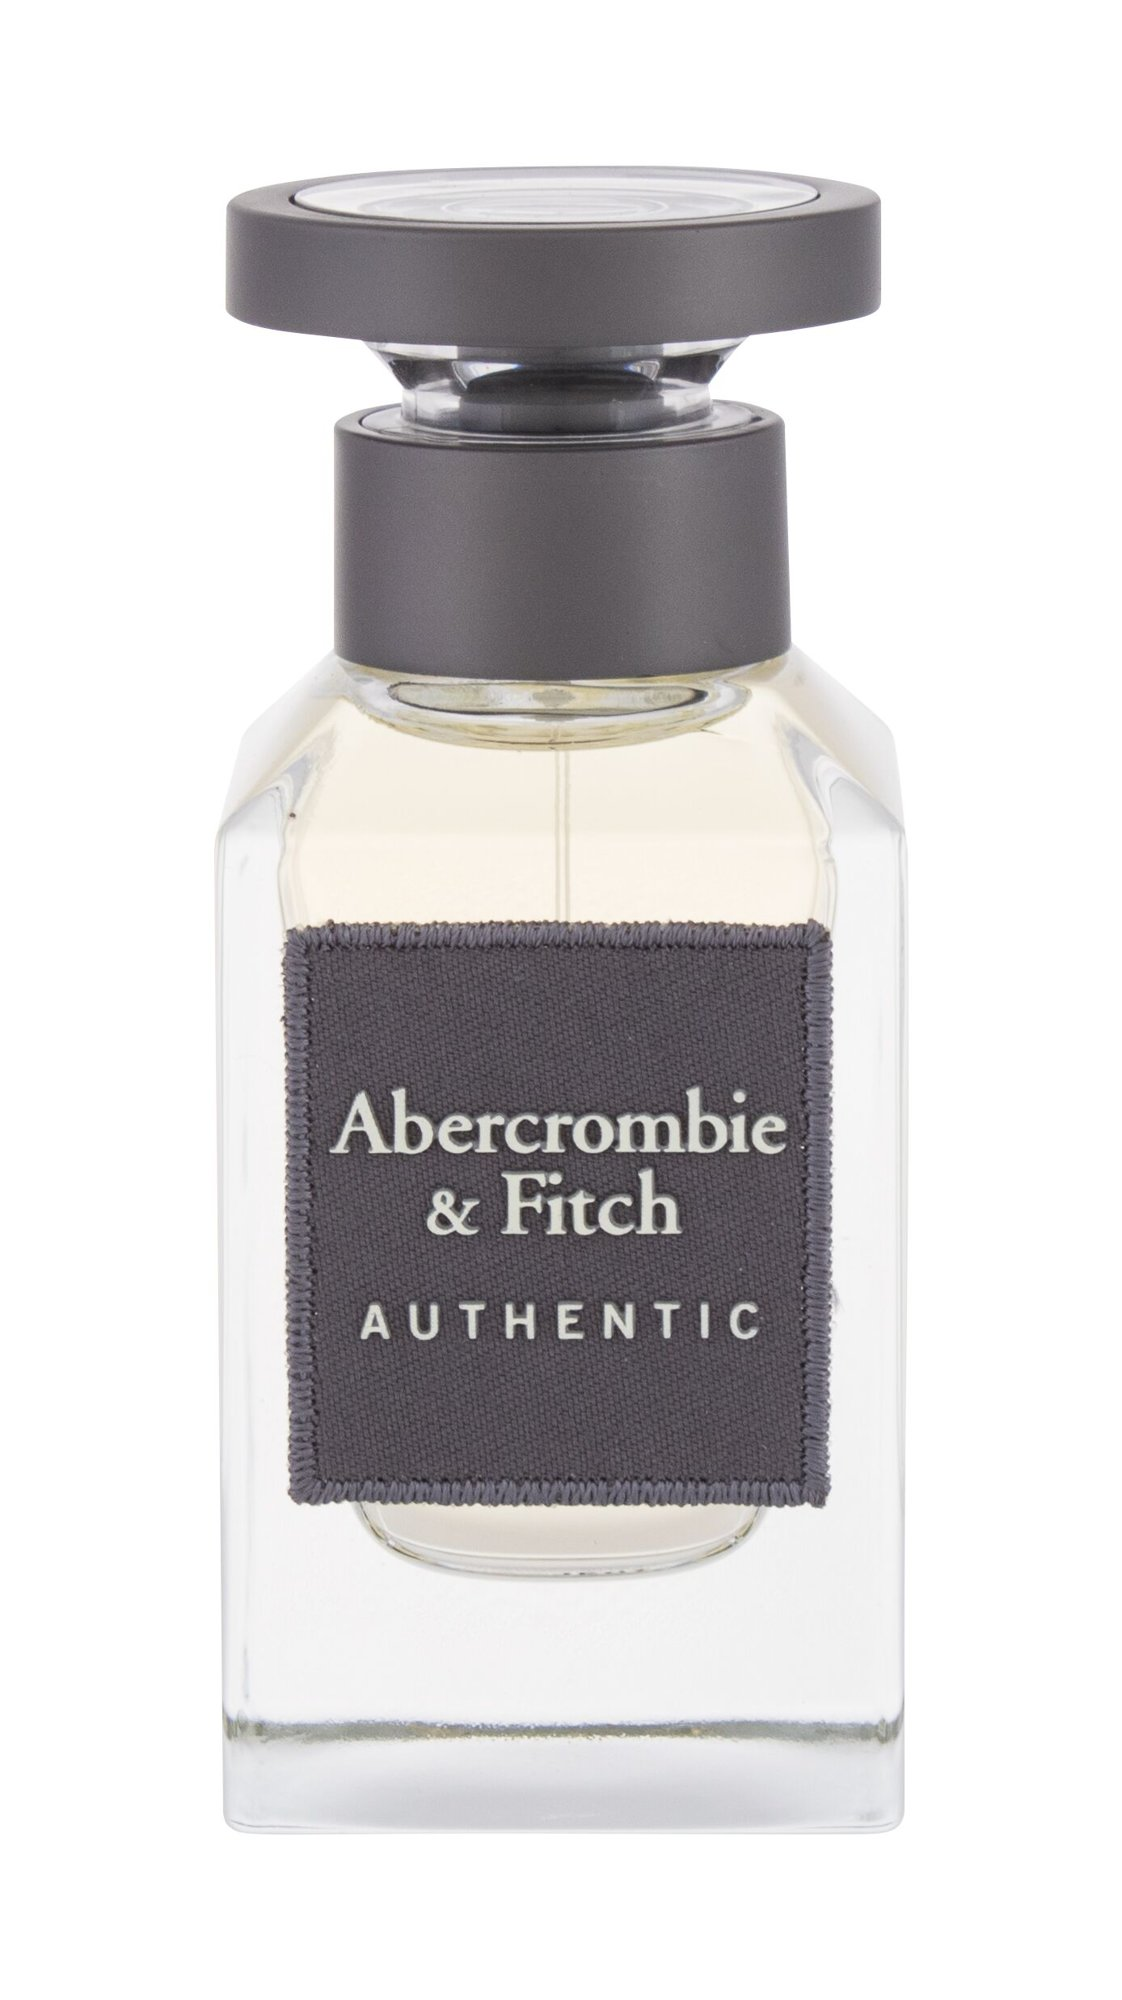 Abercrombie & Fitch Authentic, Toaletná voda 50ml